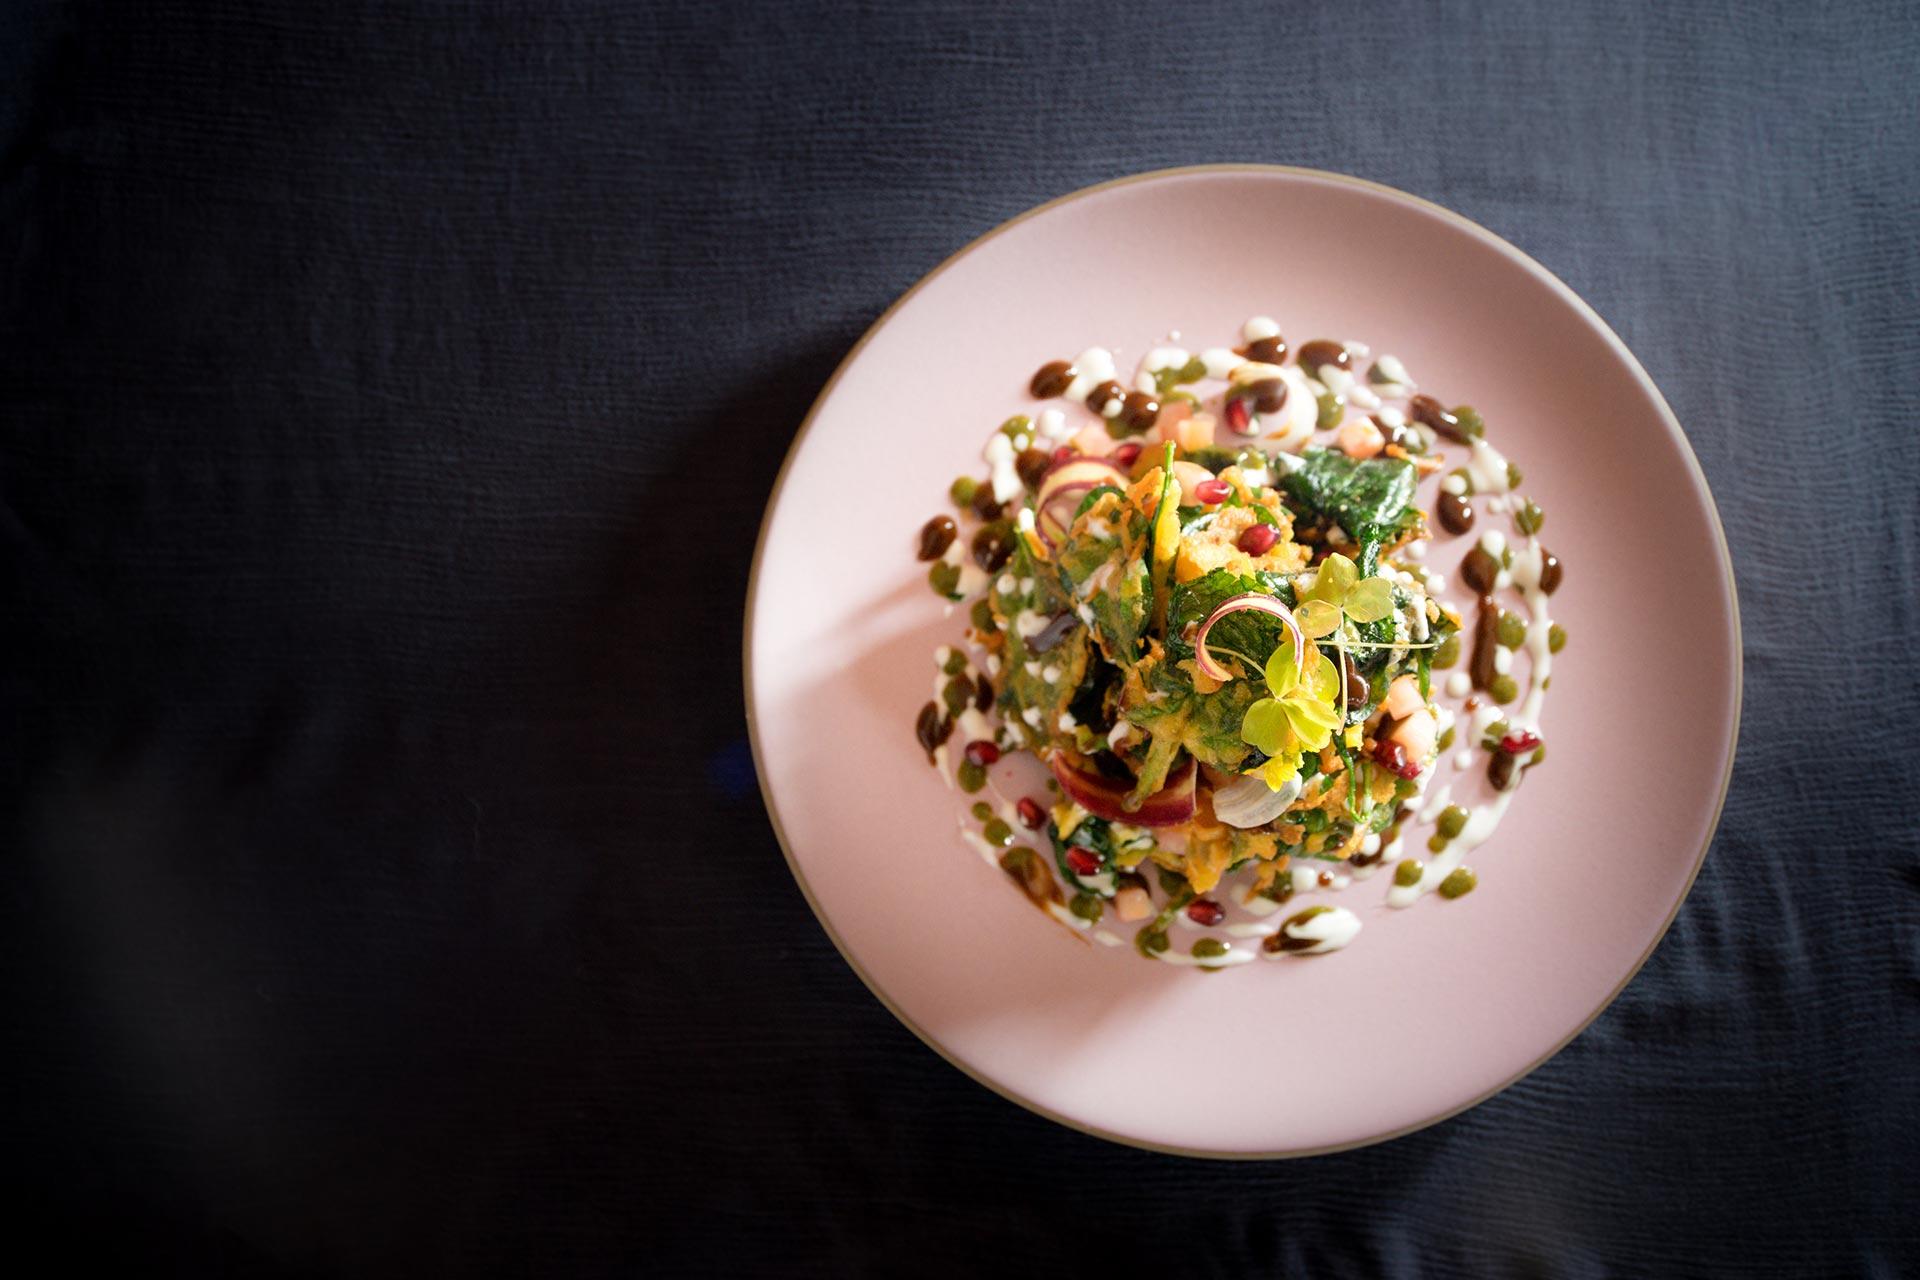 keeva-sf-restaurant-food-photographer-a-few-good-clicks-15.jpg